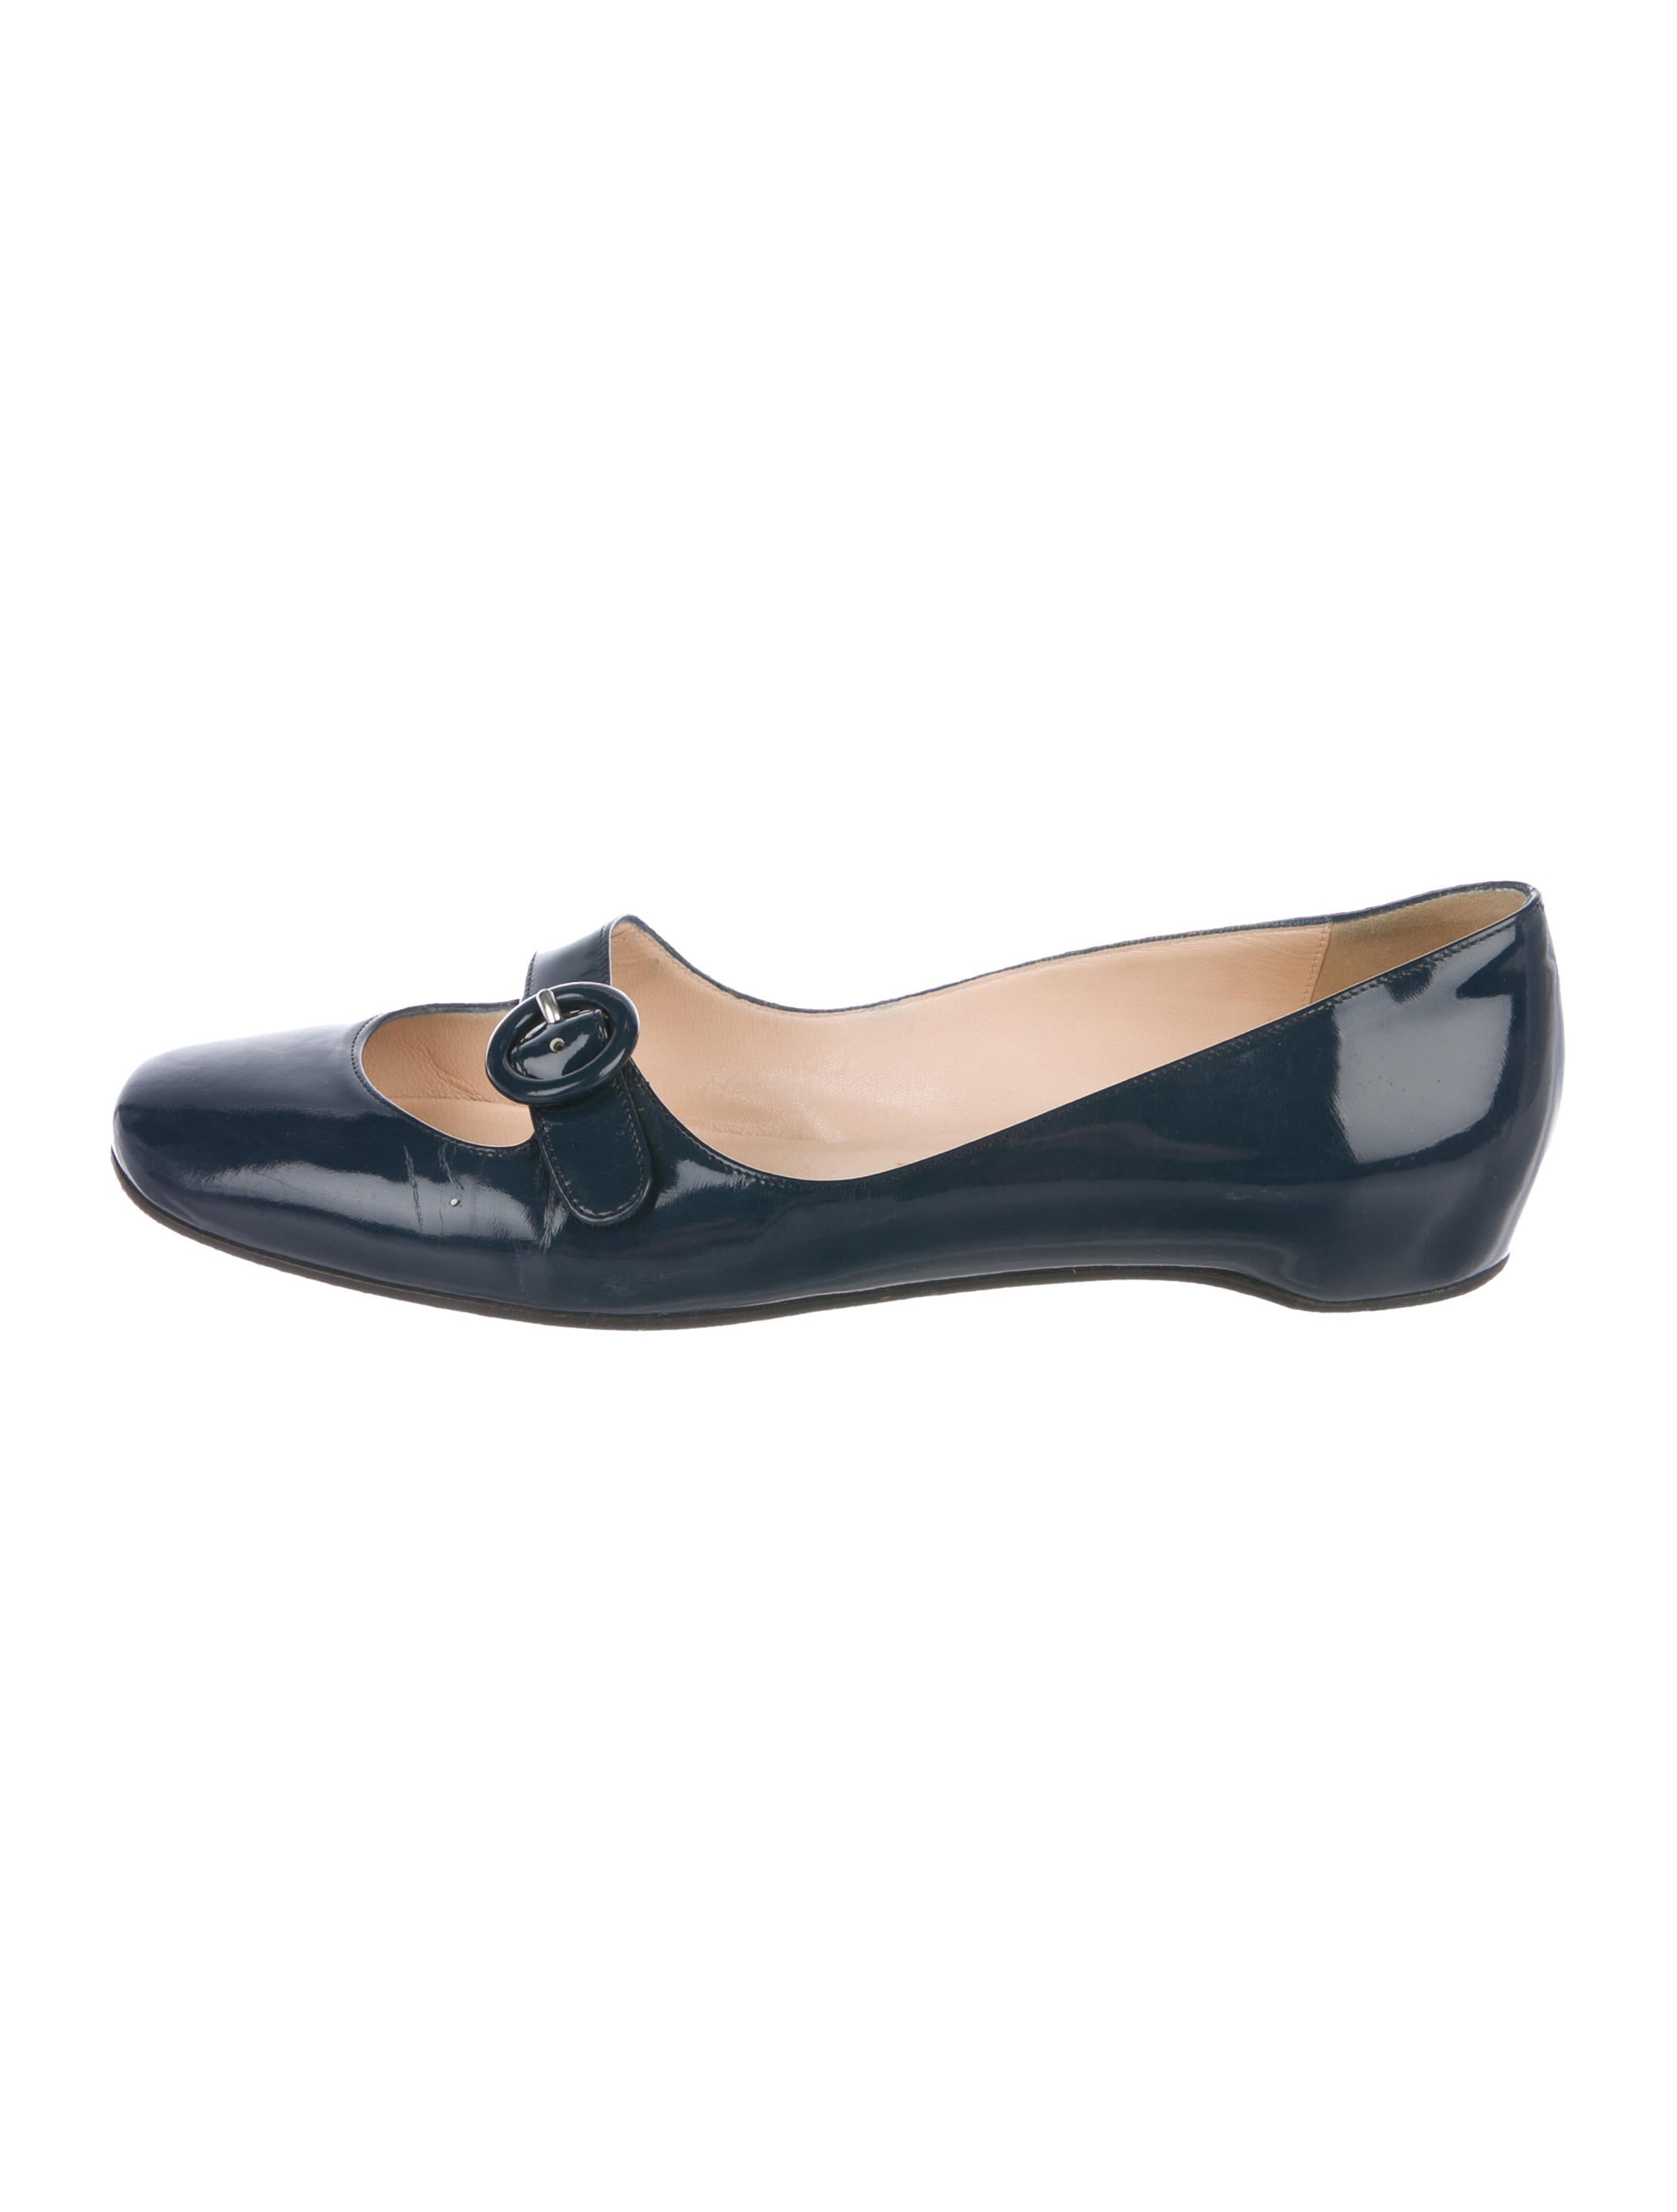 86b91260c094 Christian Louboutin Patent Leather Mary-Jane Flats - Shoes ...